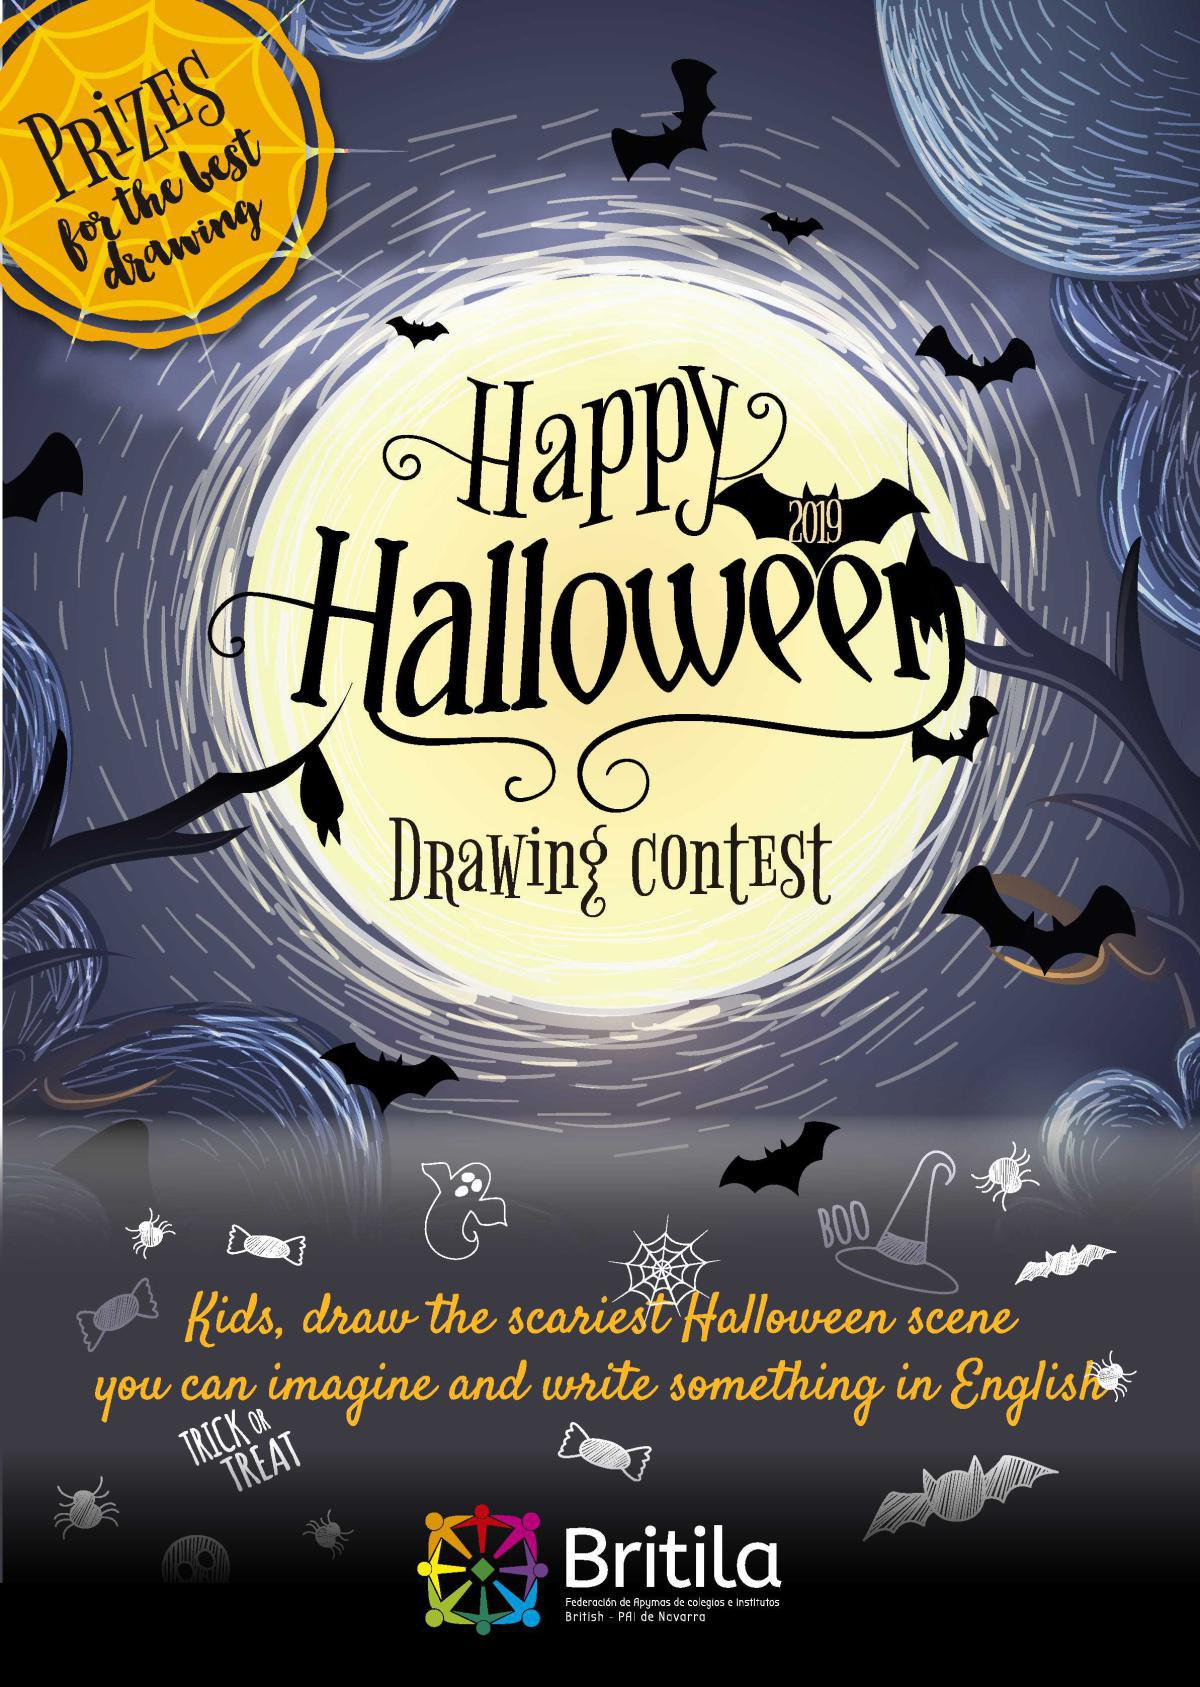 Trick or treat Halloween: Concurso de dibujo